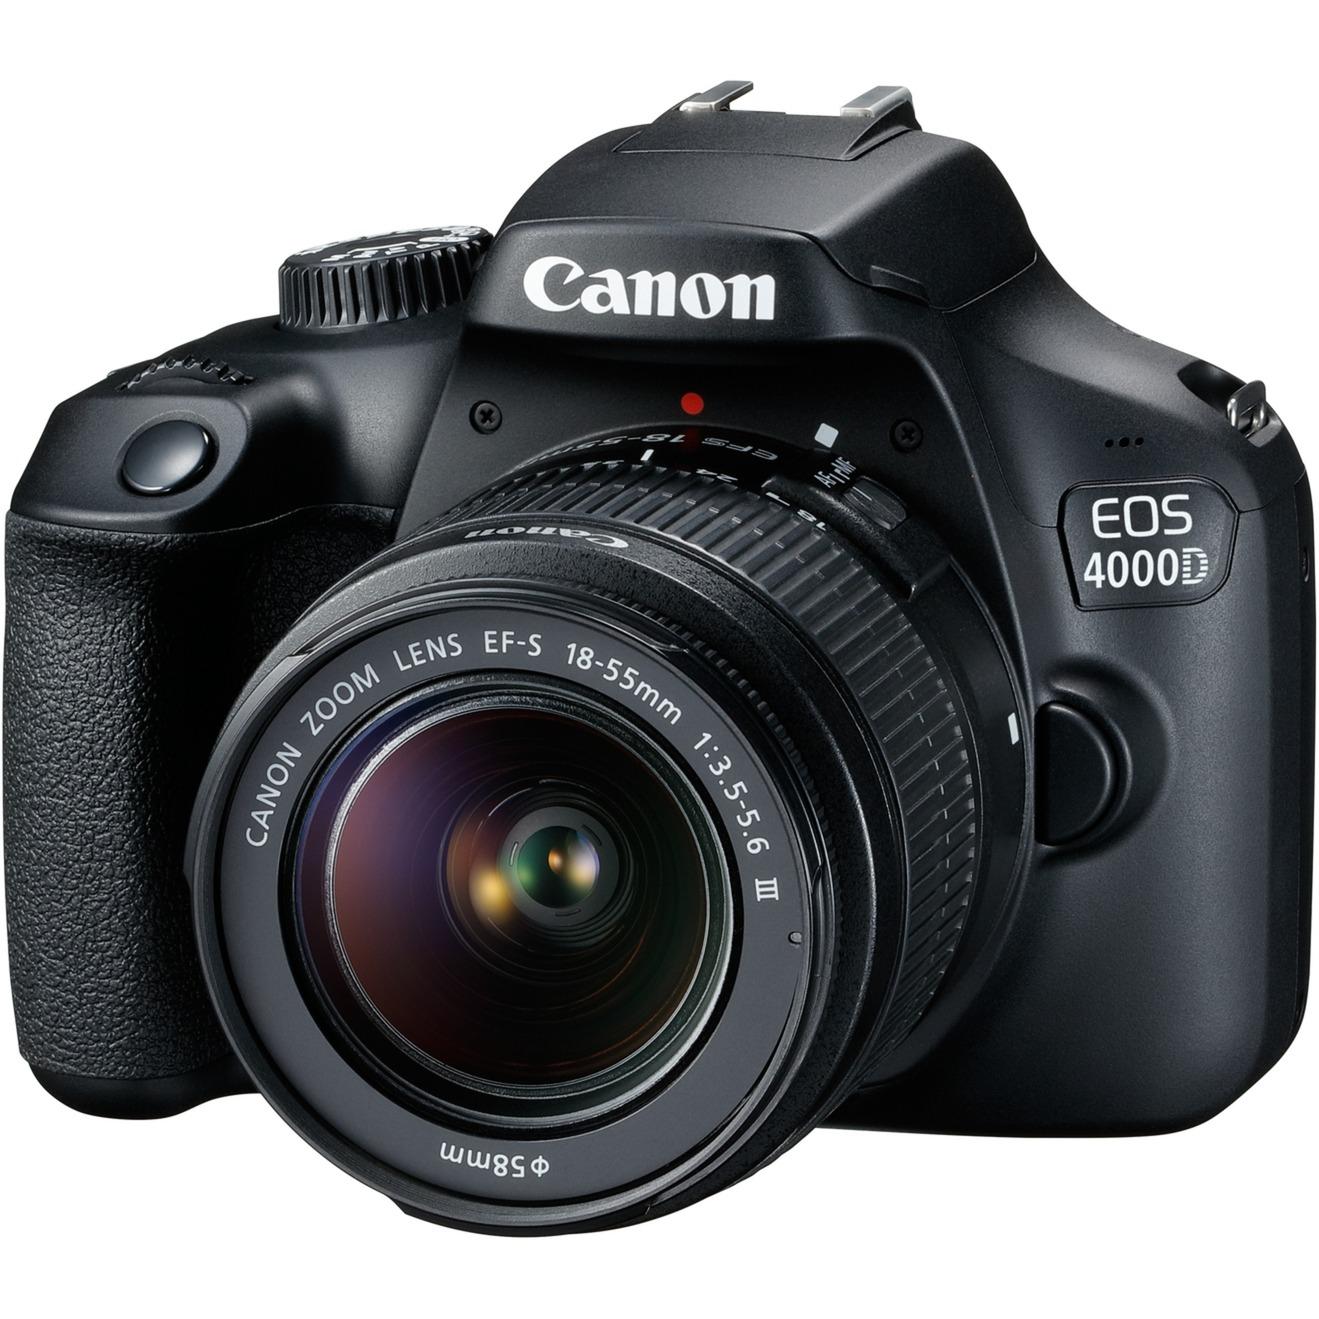 EOS 4000D Juego de cámara SLR 18 MP 5184 x 3456 Pixeles Negro, Cámara digital